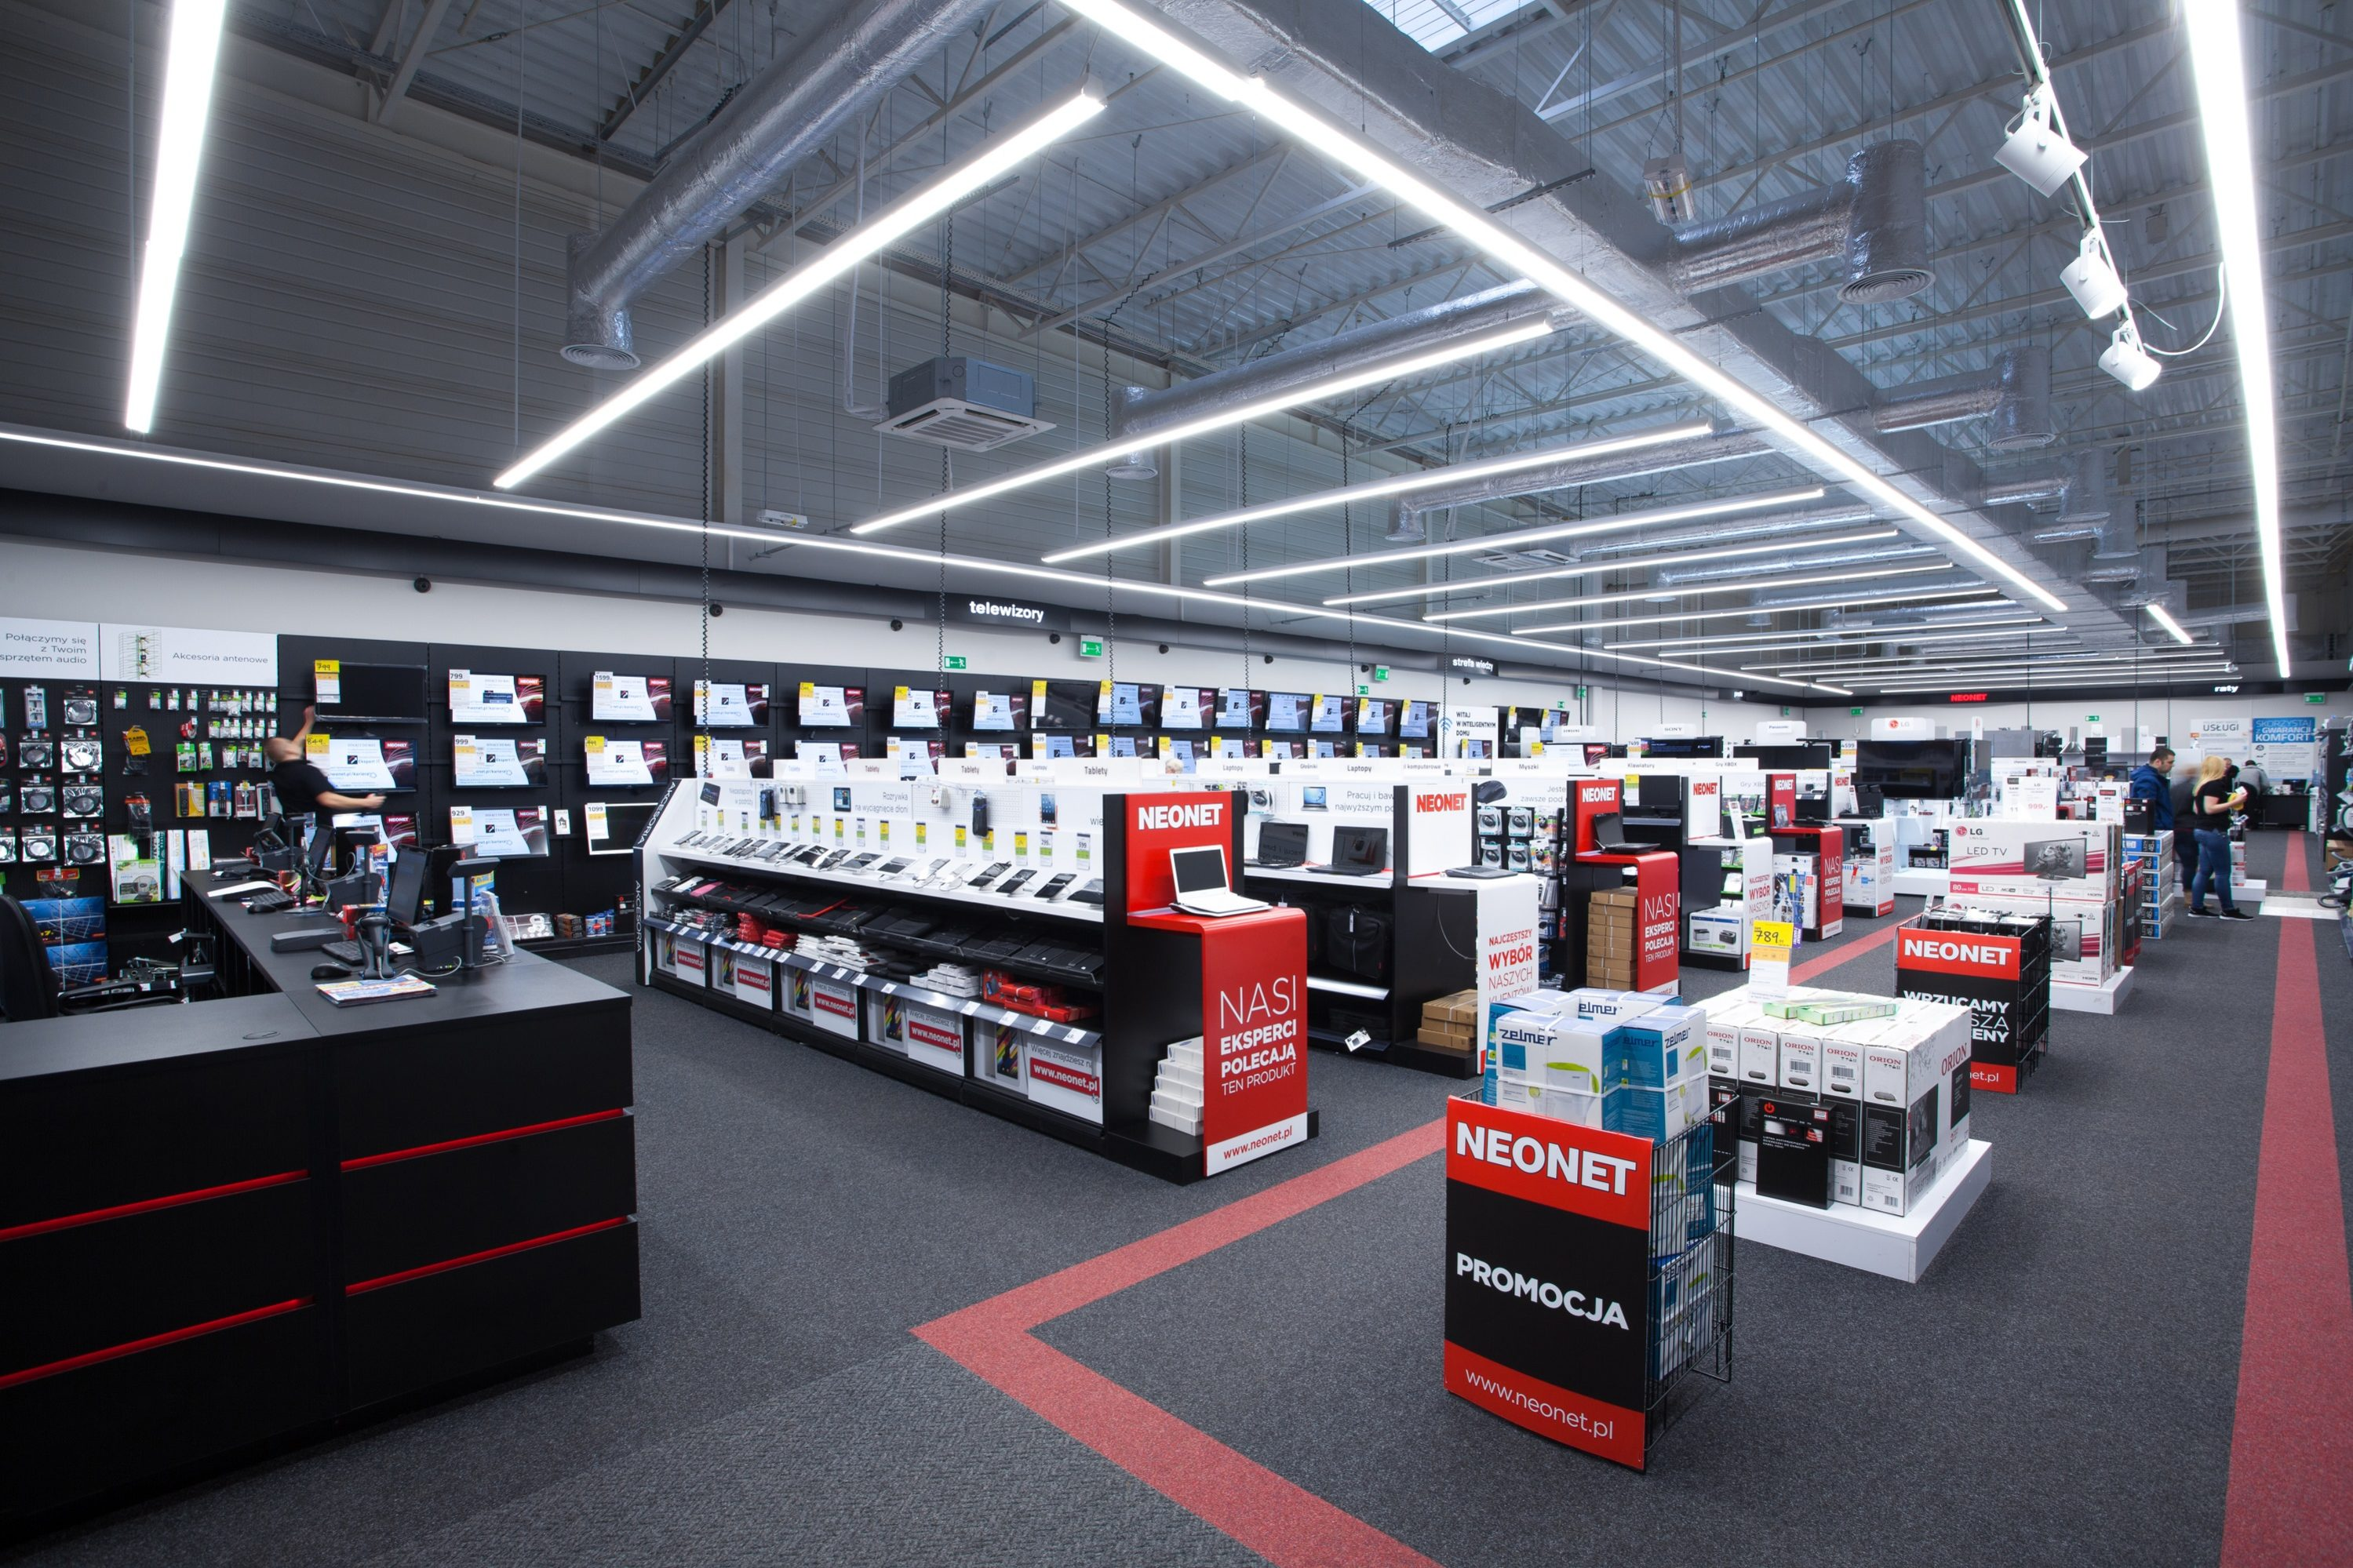 modernizacja sklepu Neonet